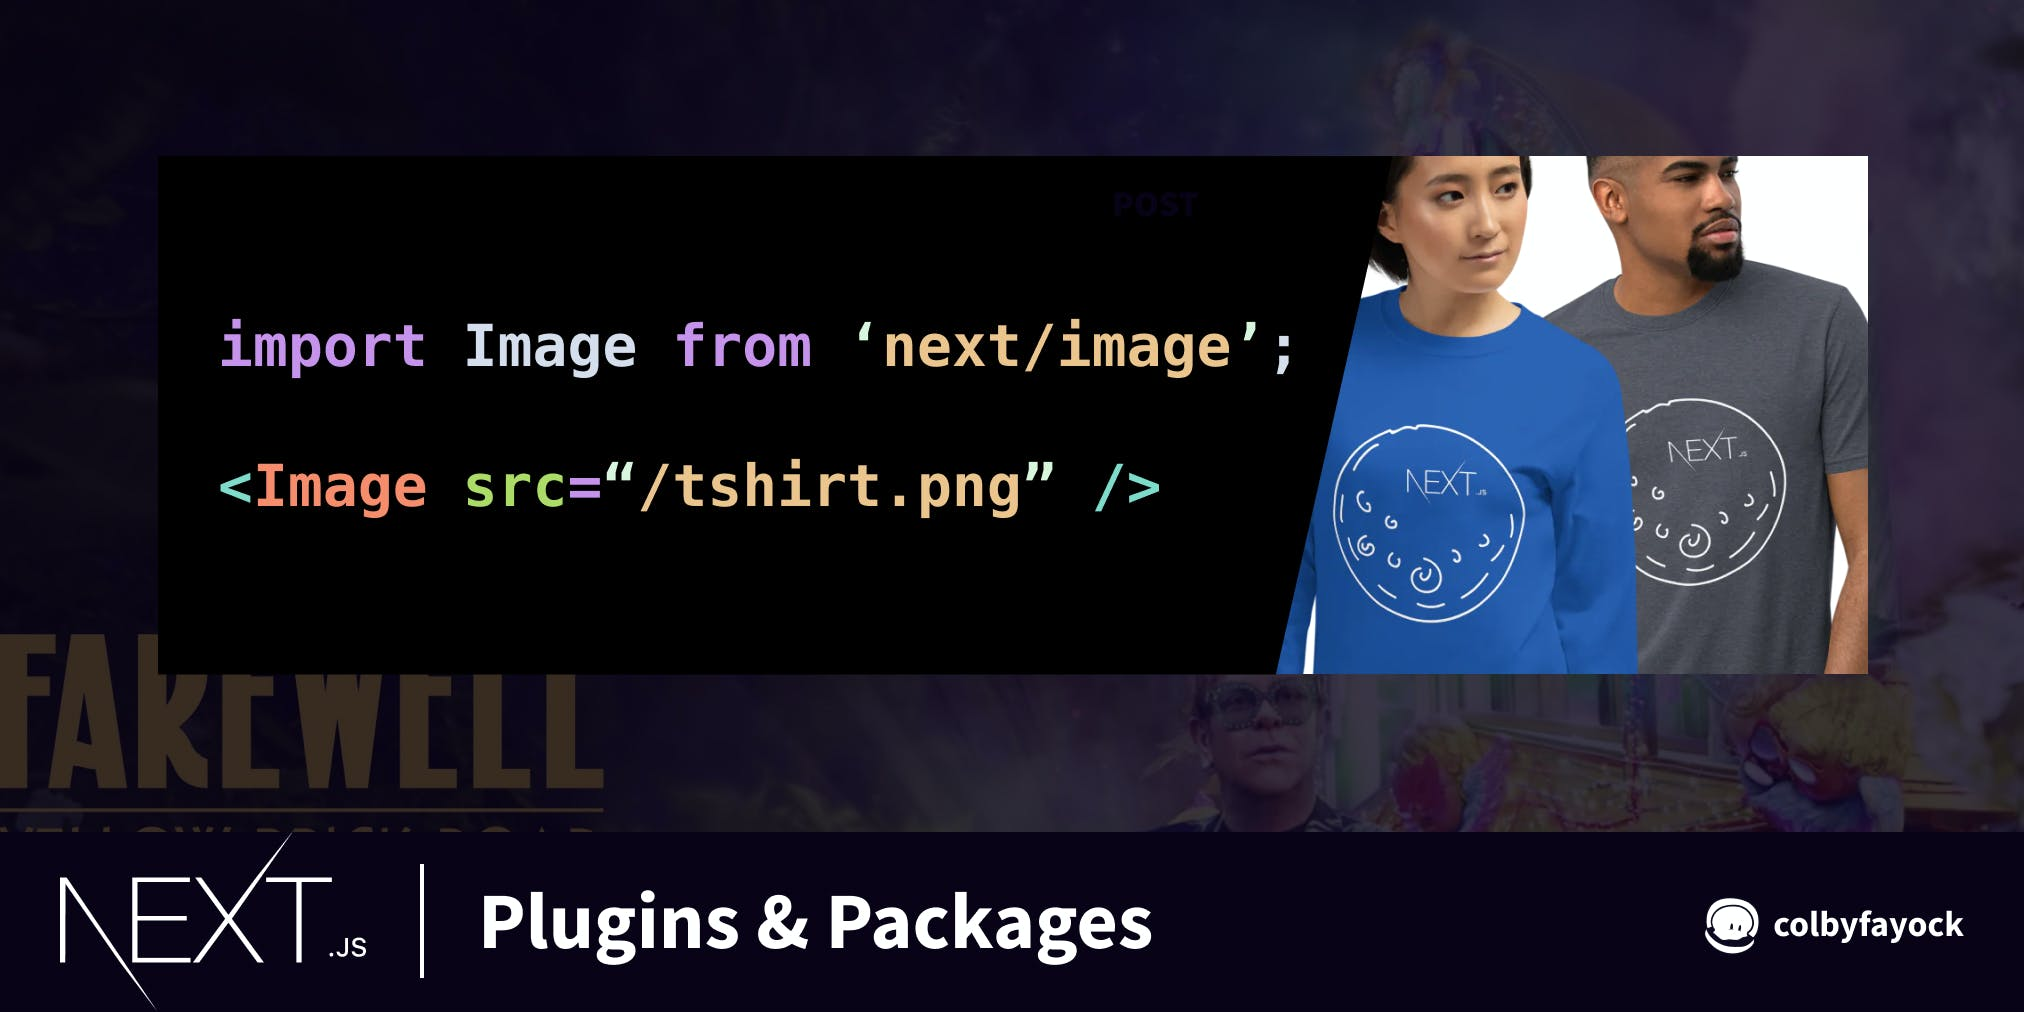 Plugins & Packages